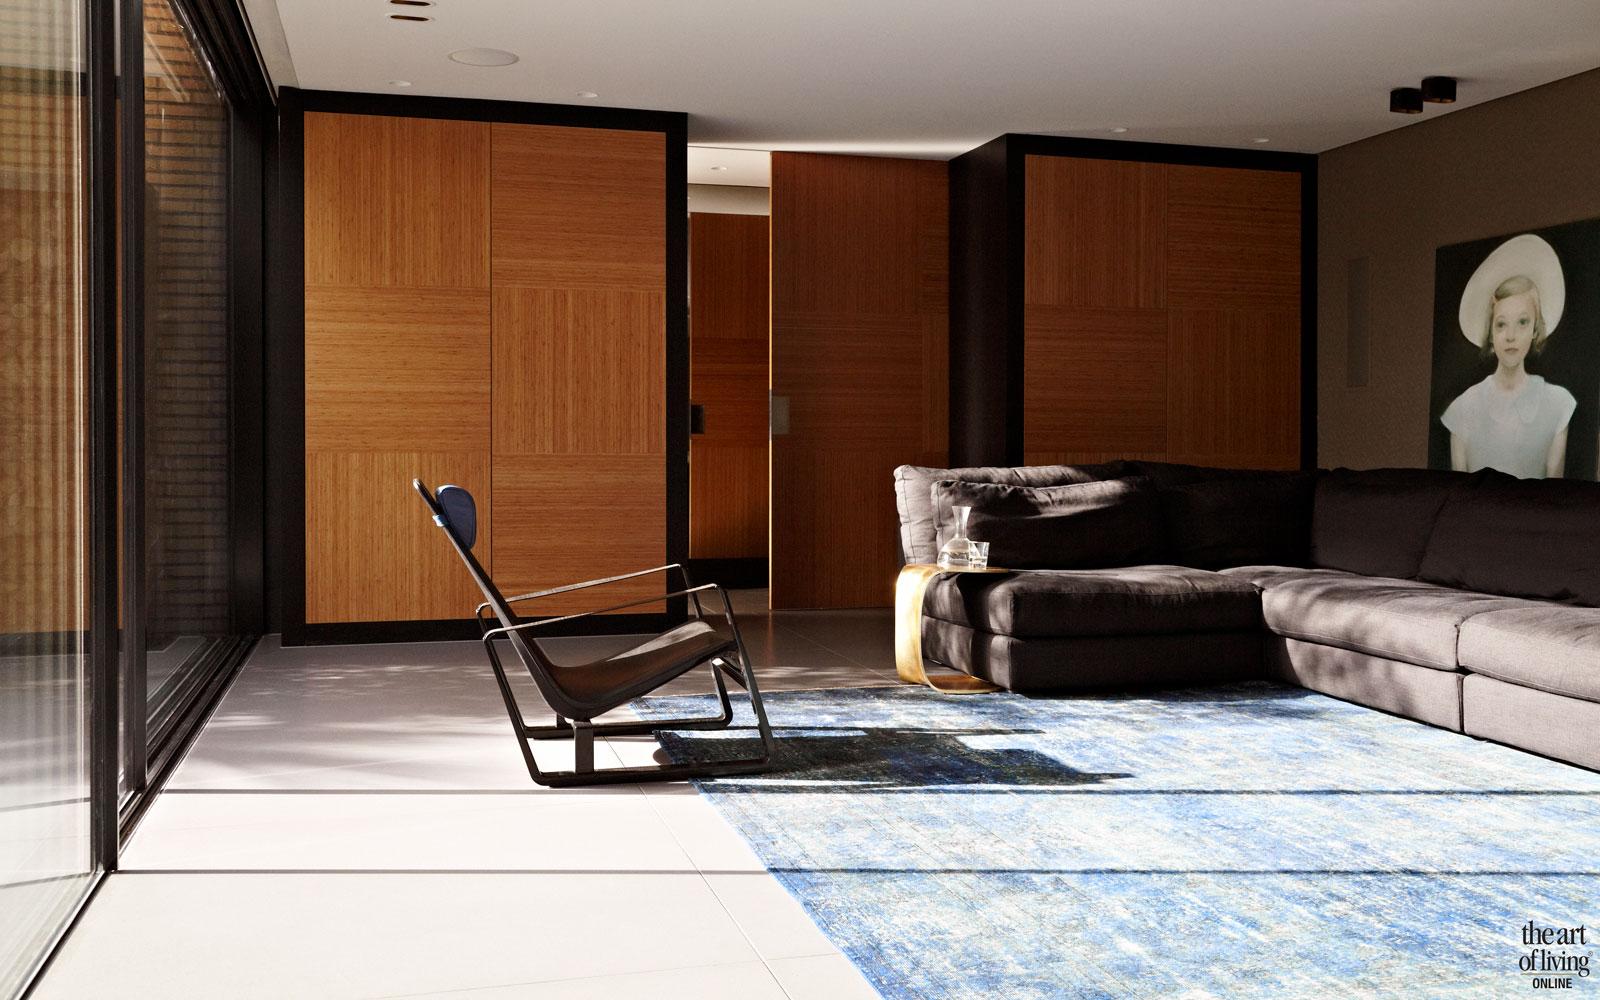 Woonkamer, Vitra, stoelen, meubilair, grote ramen, hout, extreme verbouwing, Osiris Hertman